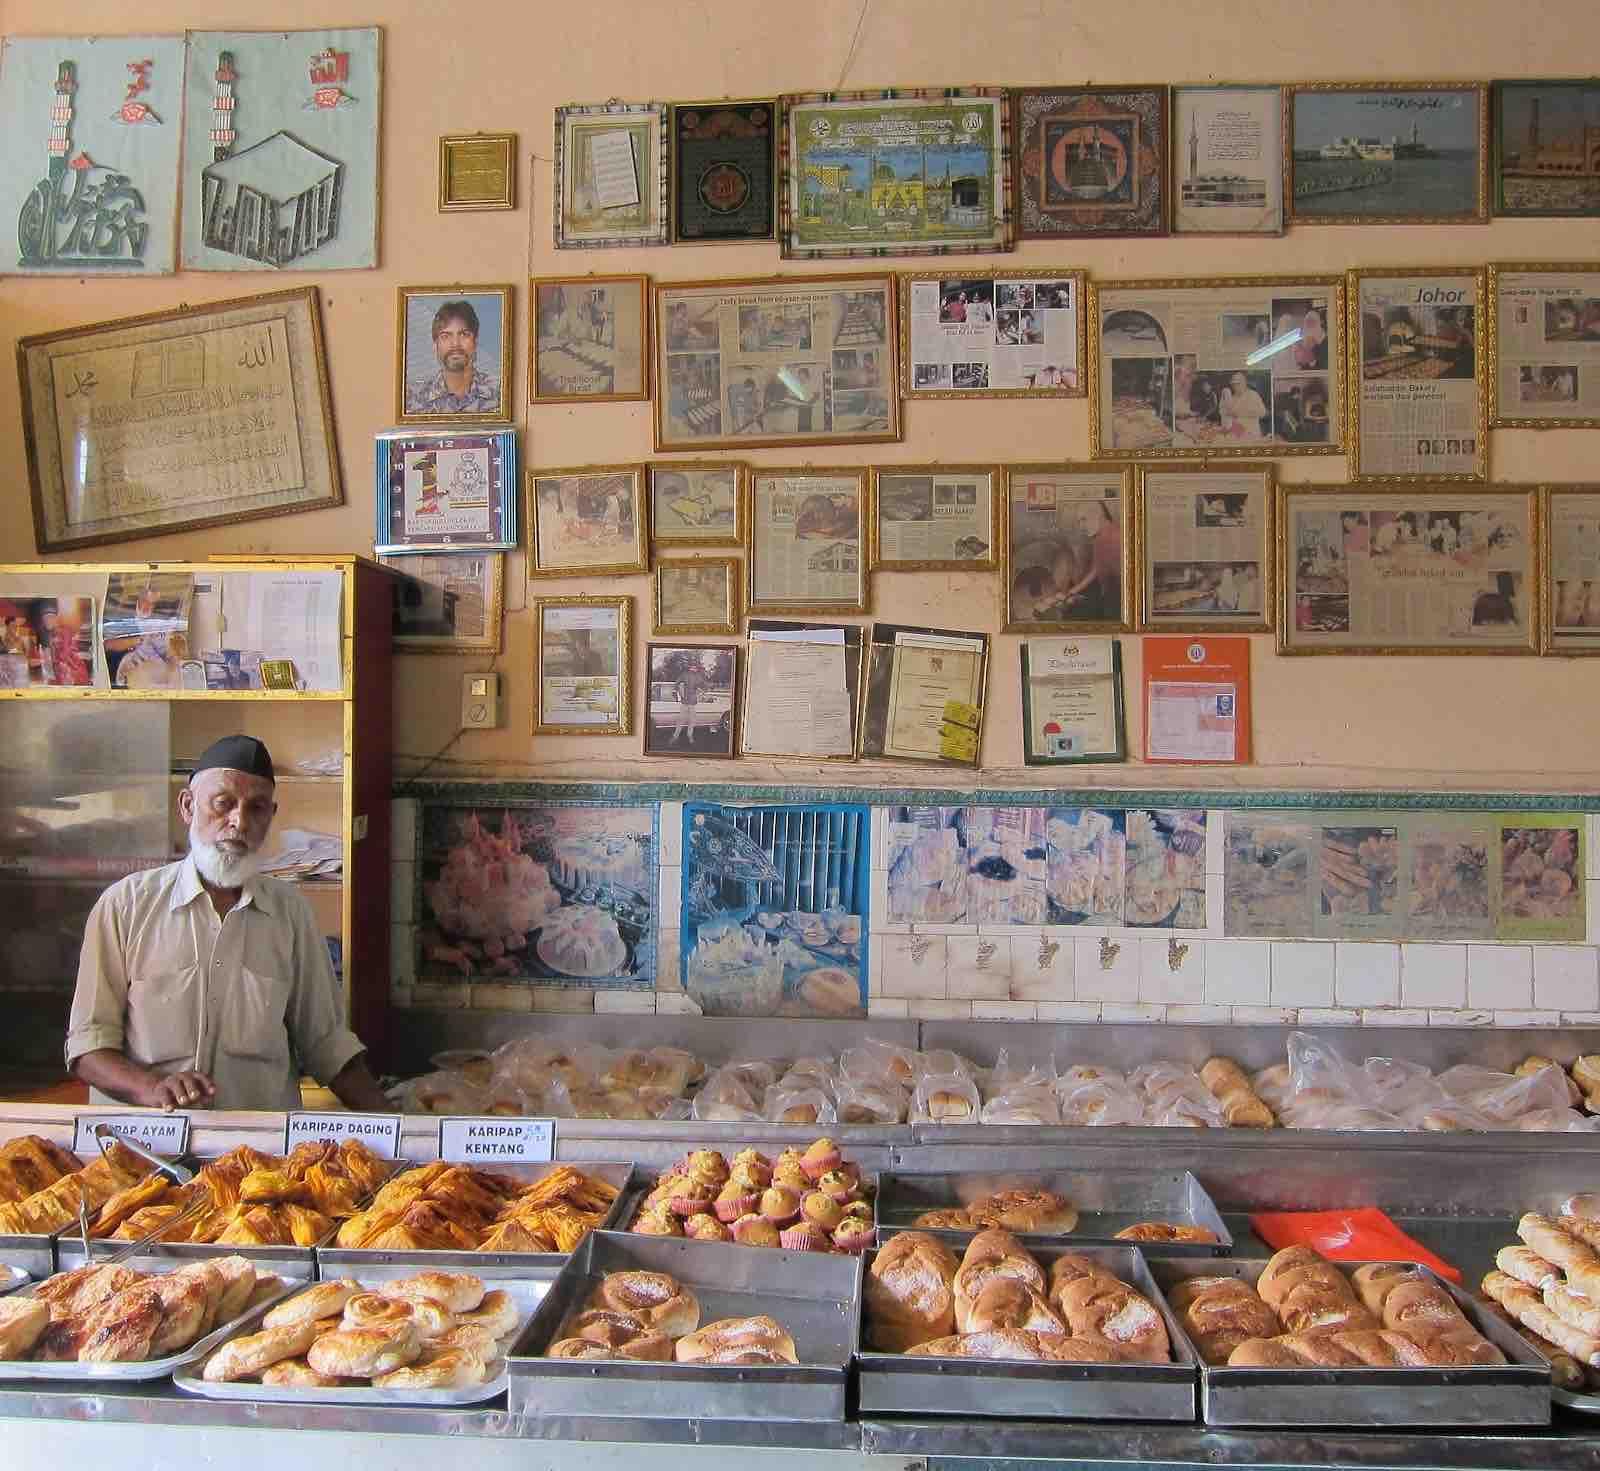 Salahuddin Bakery Johor Bahru Malaysia - AspirantSG